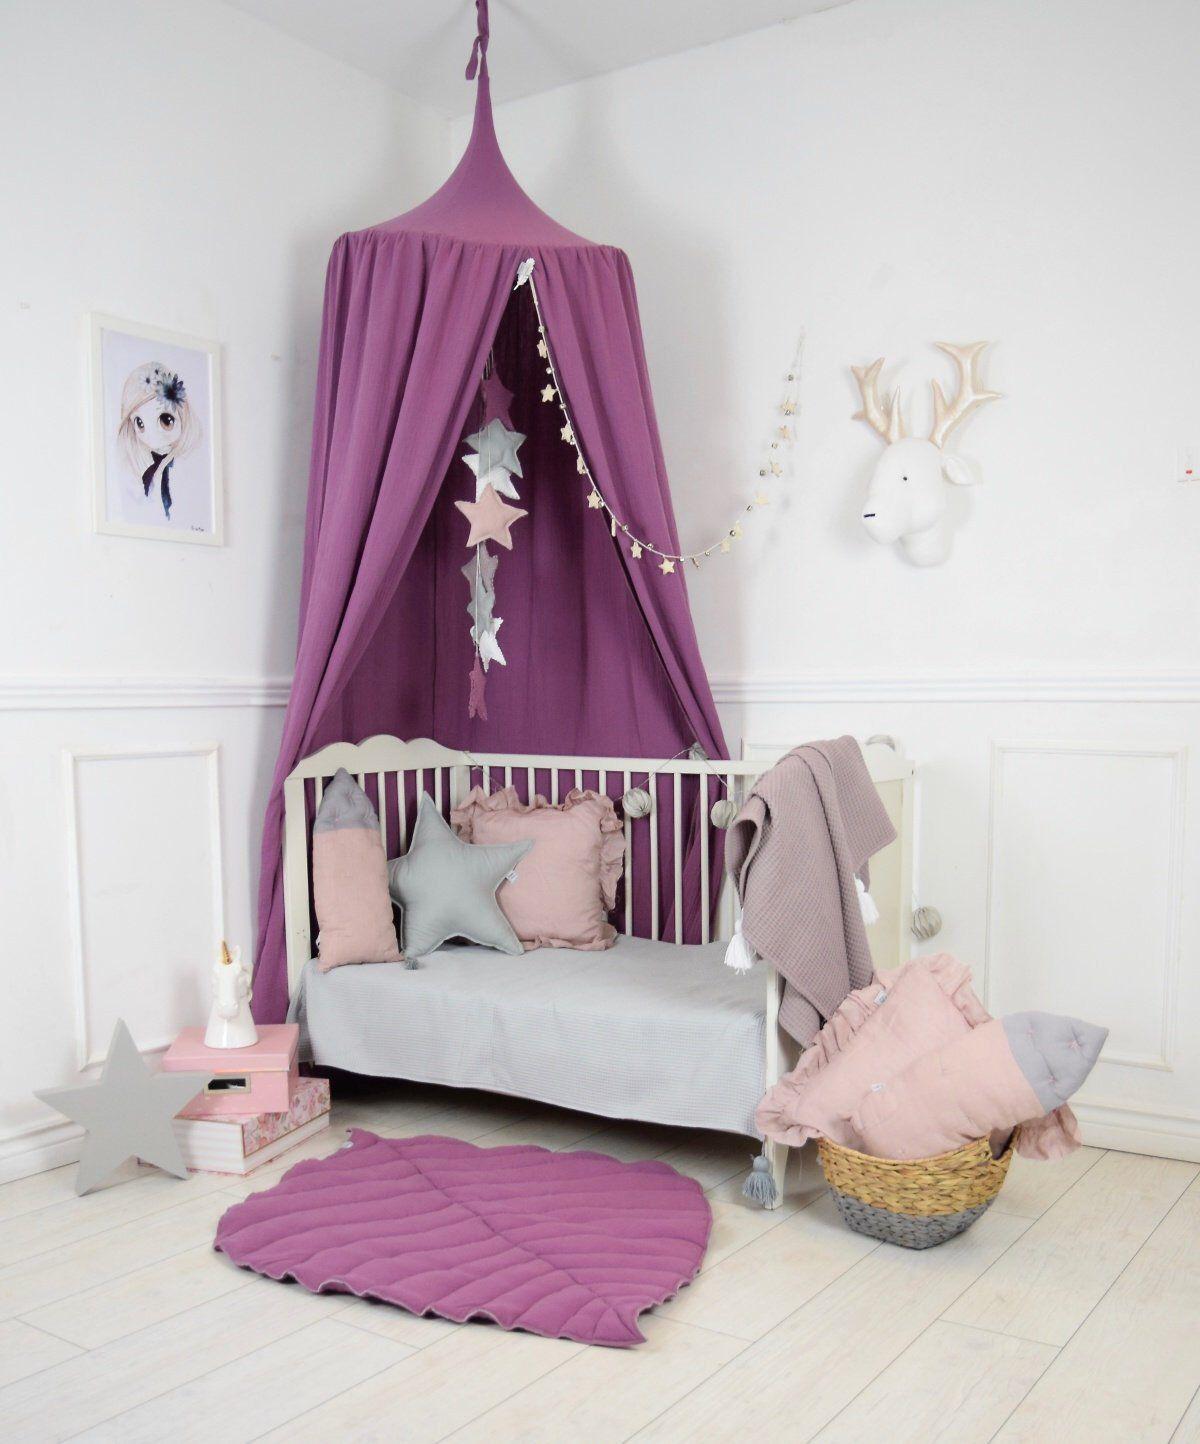 Play Canopy Blueberry Baldachin Nursery Canopy Hanging Play Tent